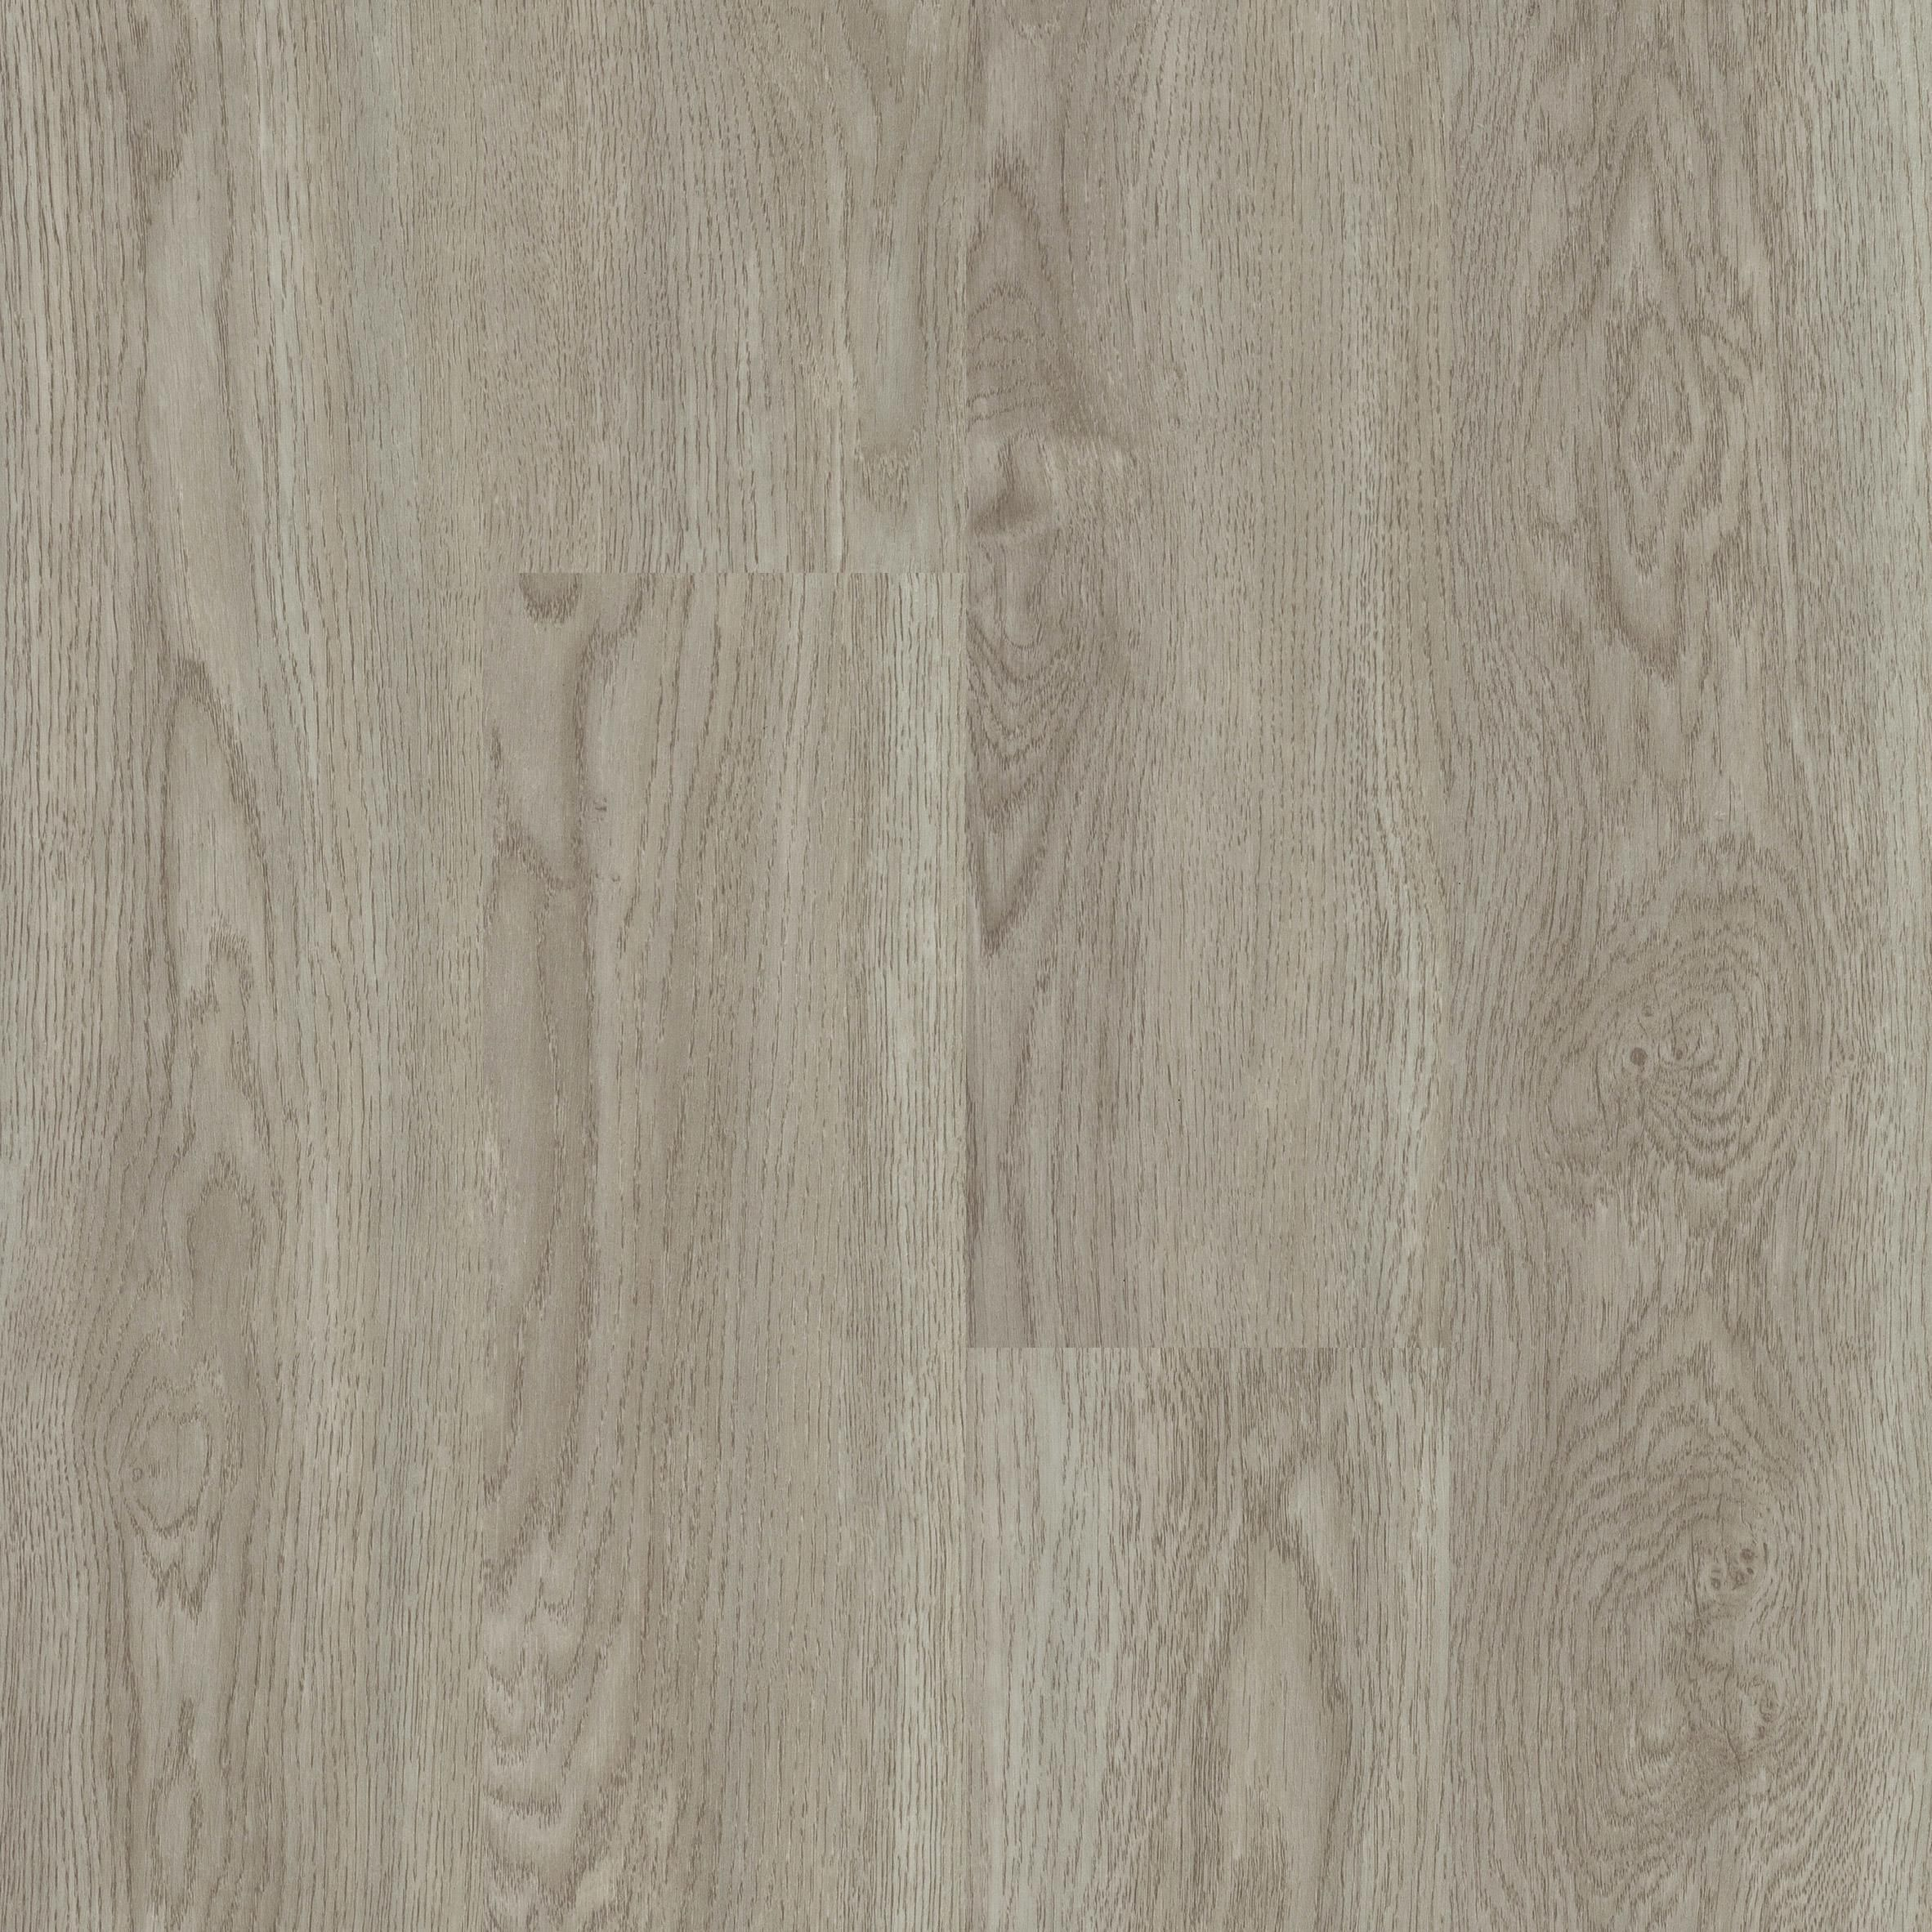 "Mohawk Rigid Luxury Vinyl Plank Claiborne Gray 6"" Wide"